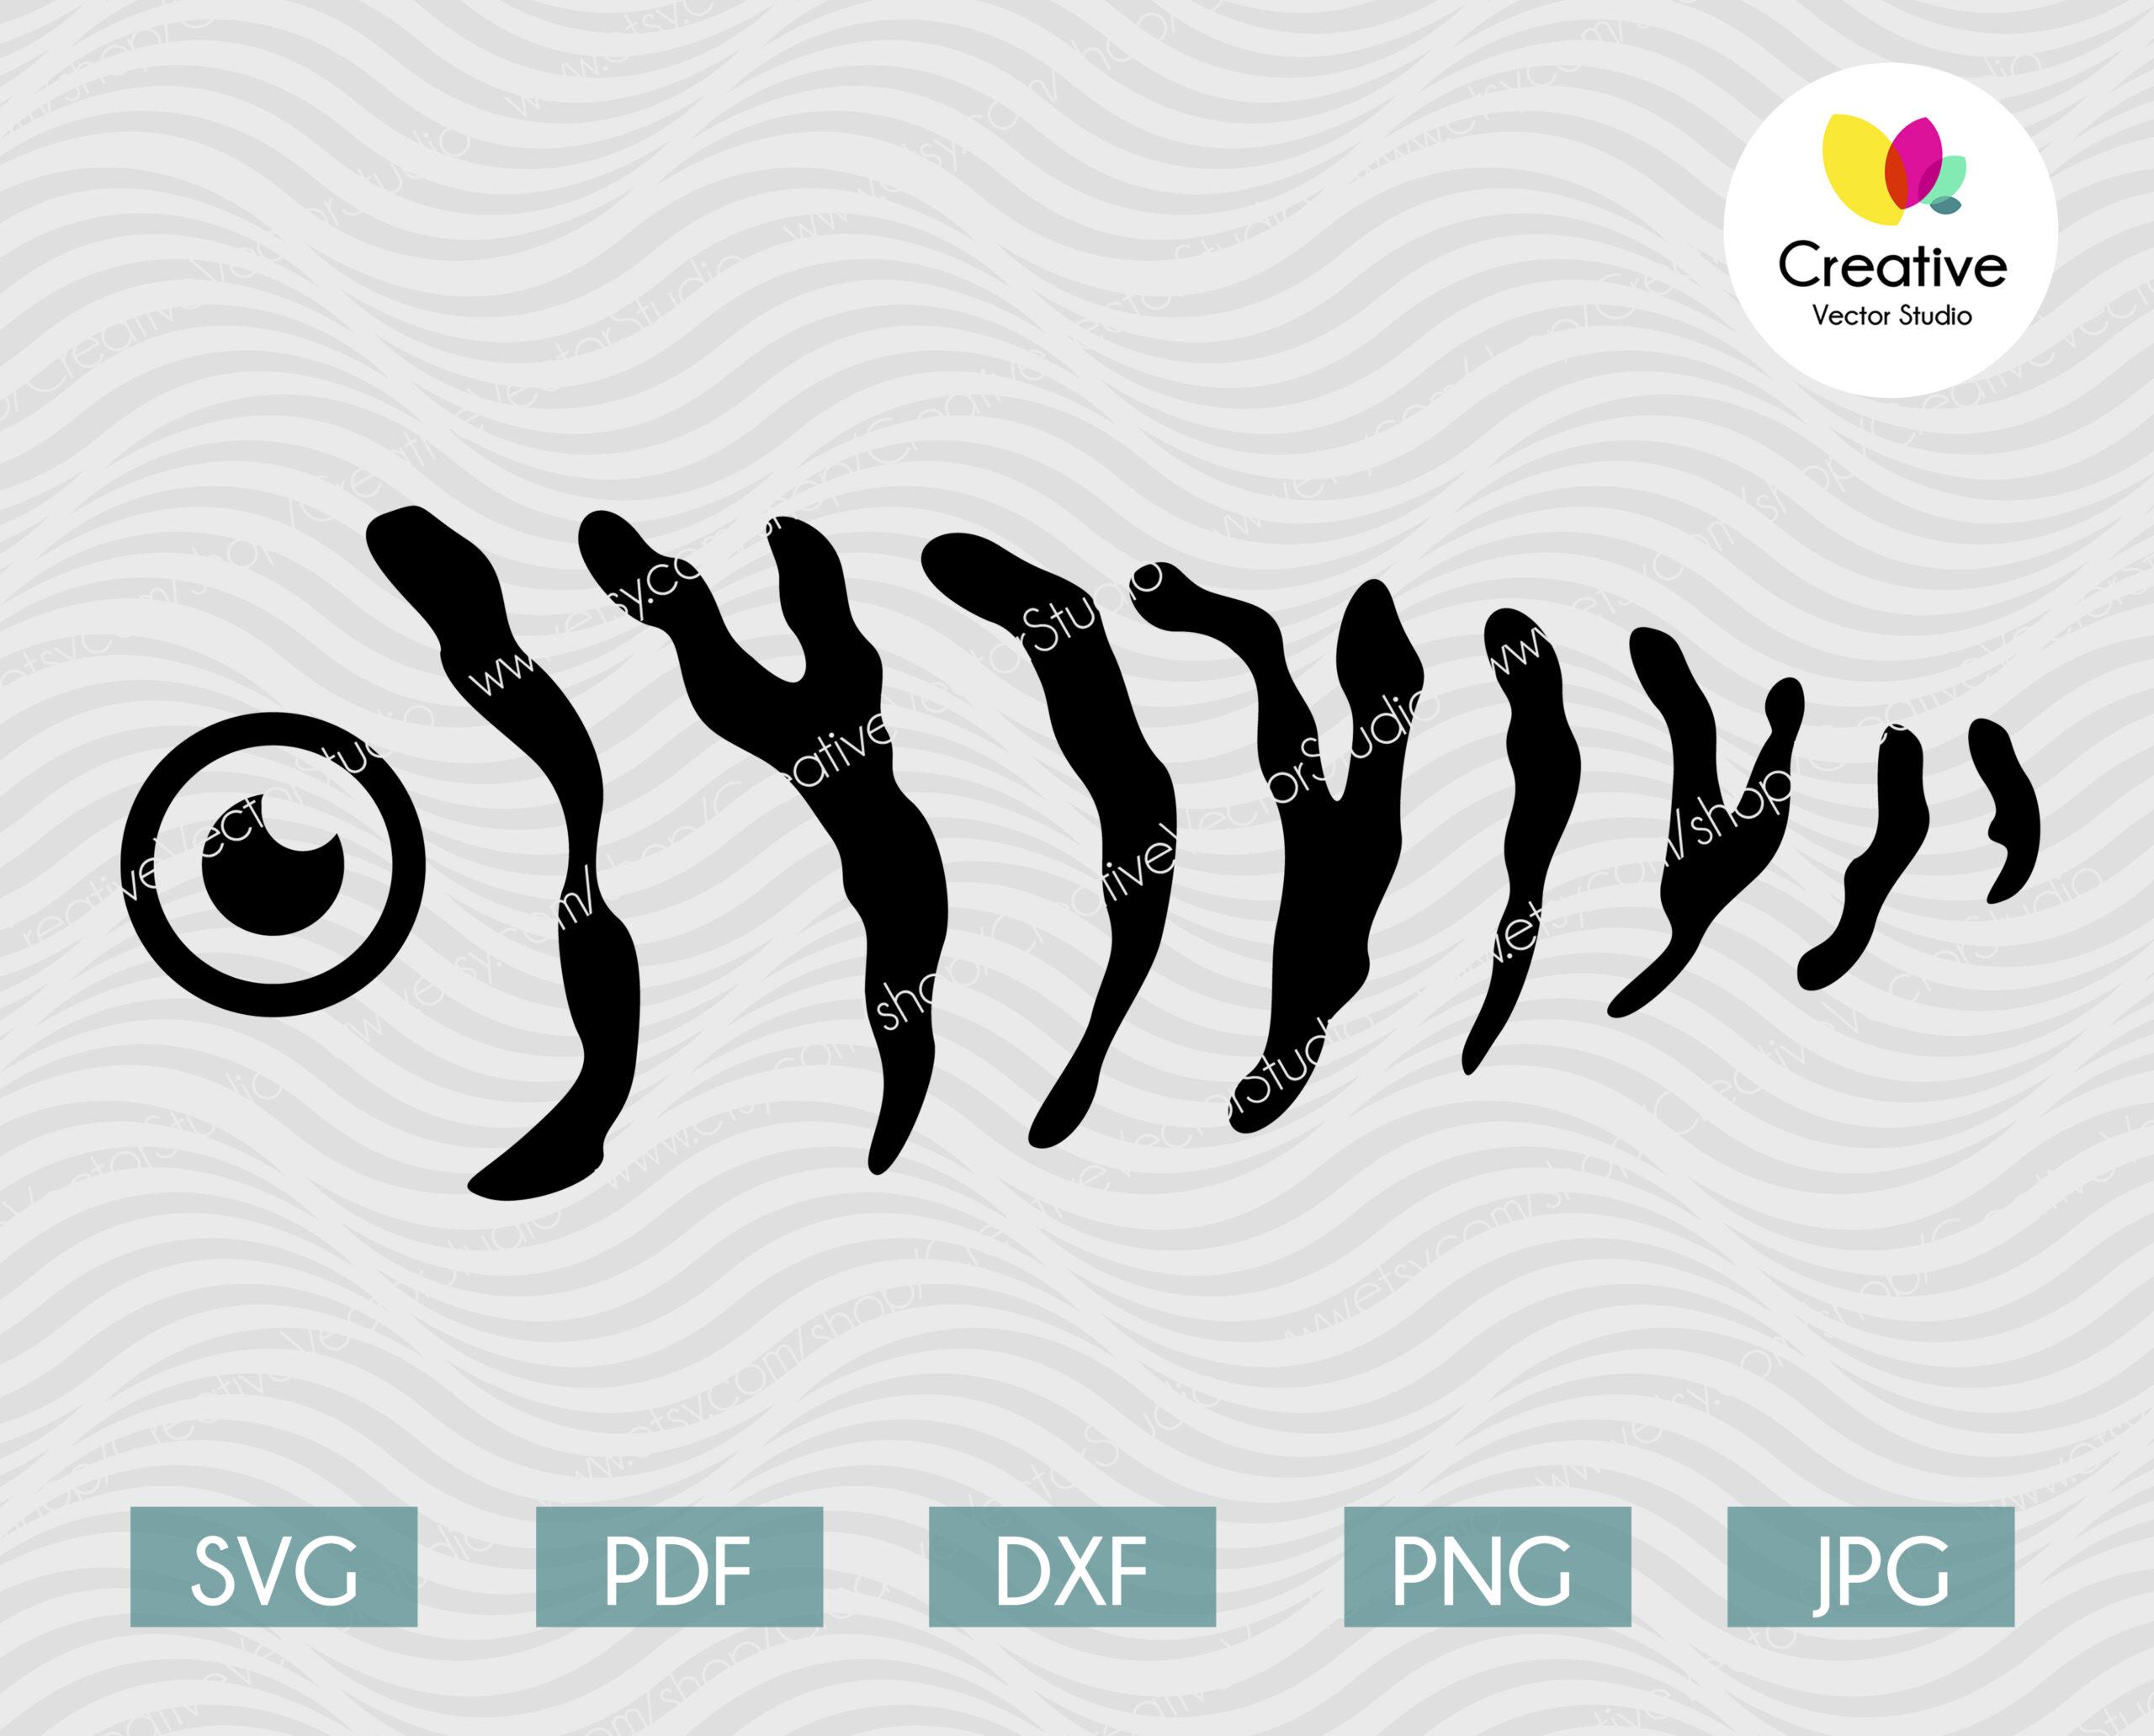 Download Fishing Lure Svg 13 Cut File Image Creative Vector Studio